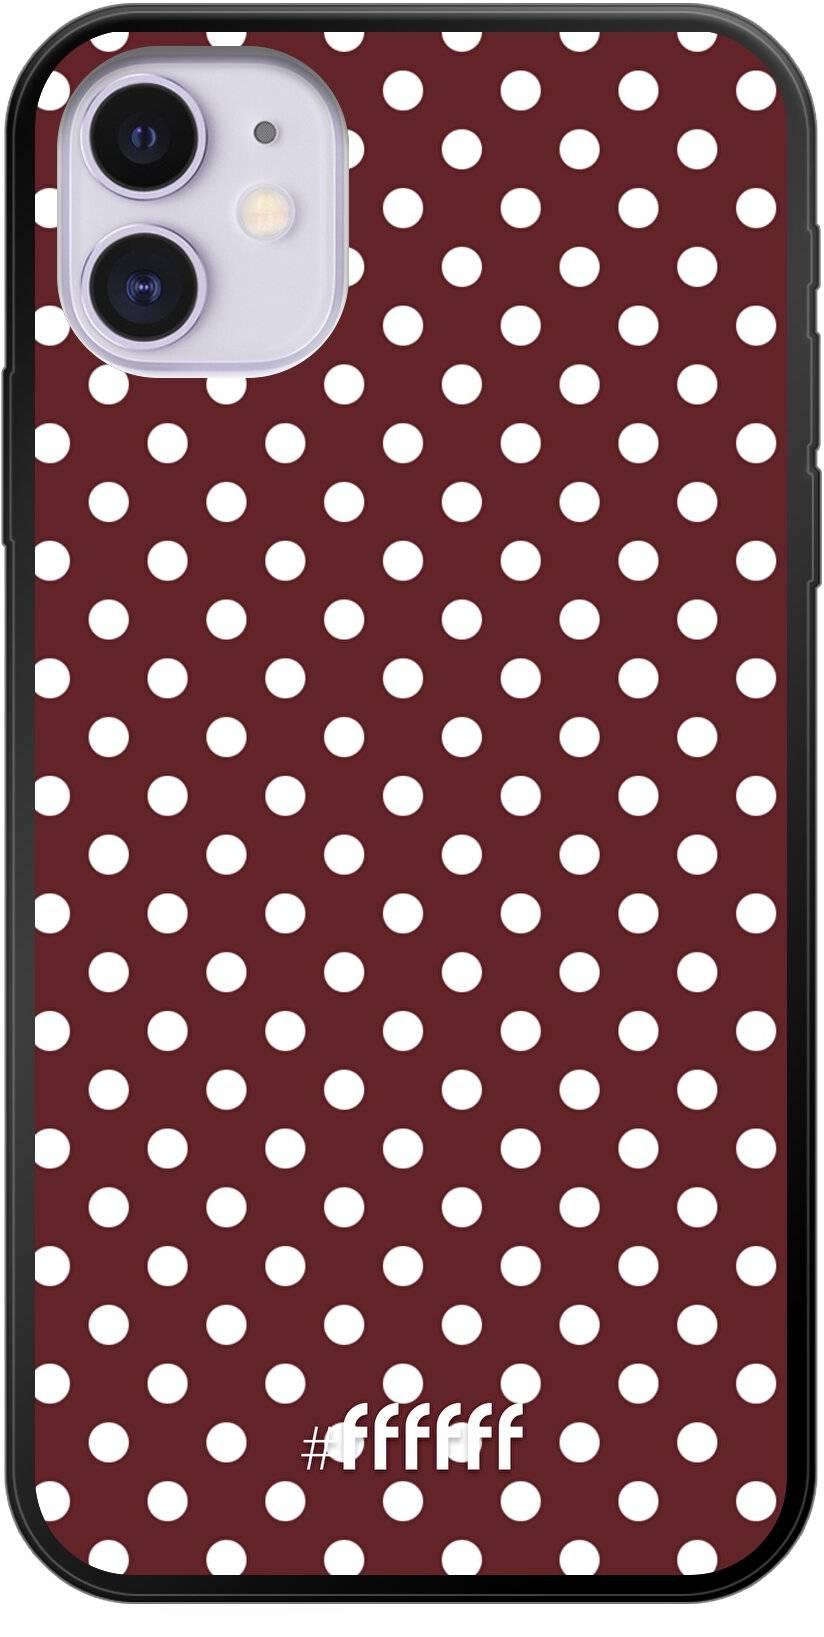 Burgundy Dots iPhone 11